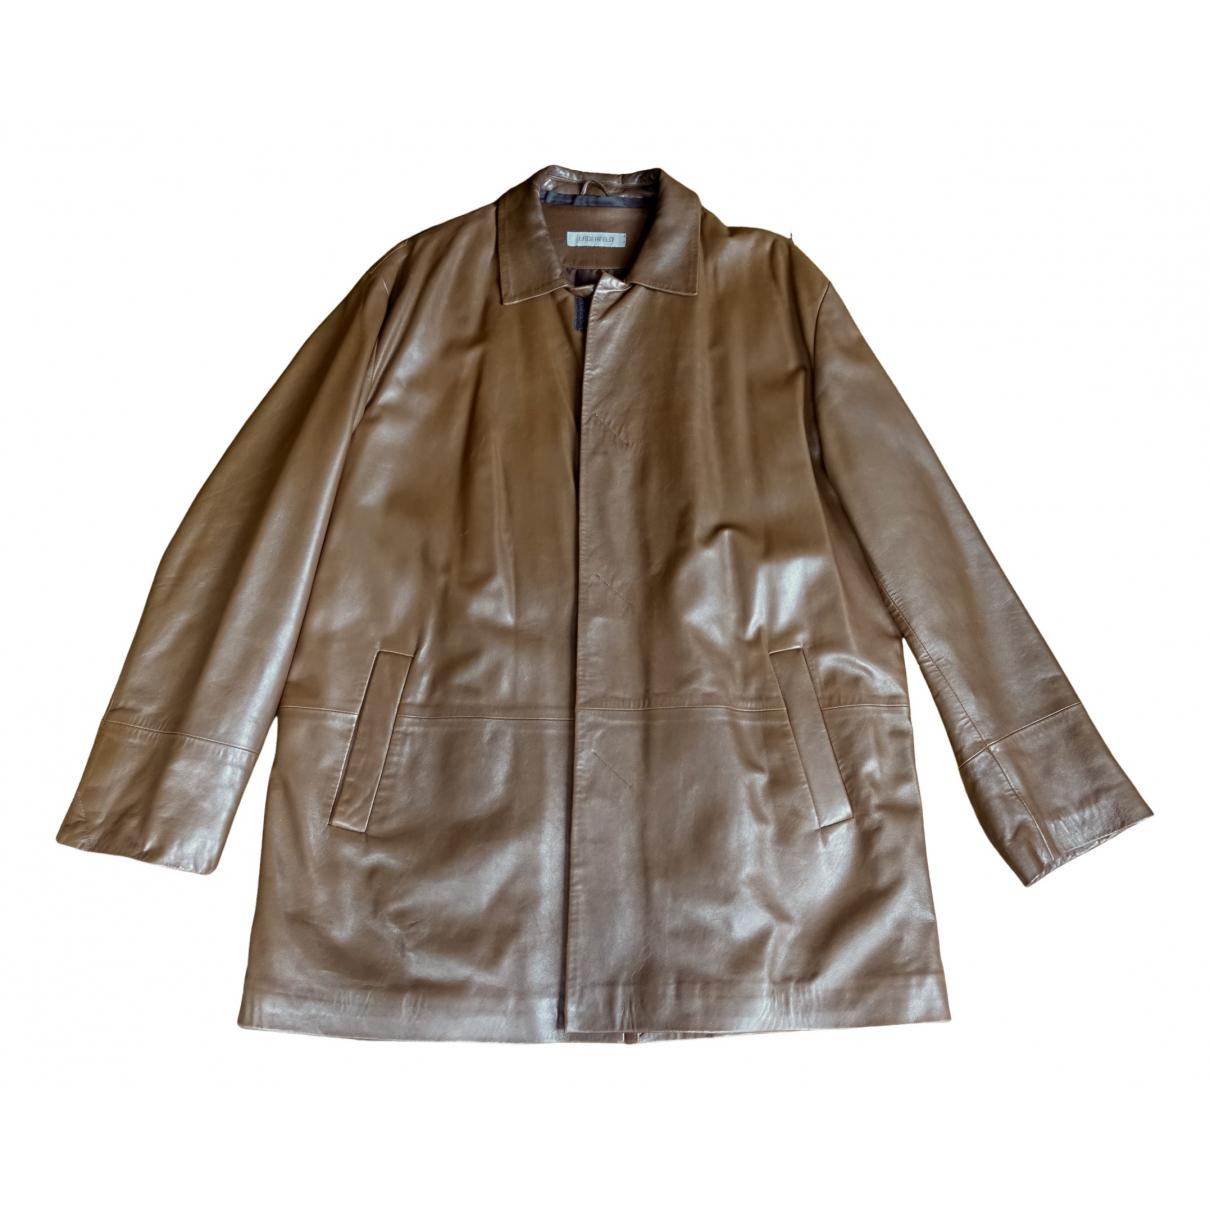 Karl Lagerfeld N Brown Leather coat  for Men 52 FR